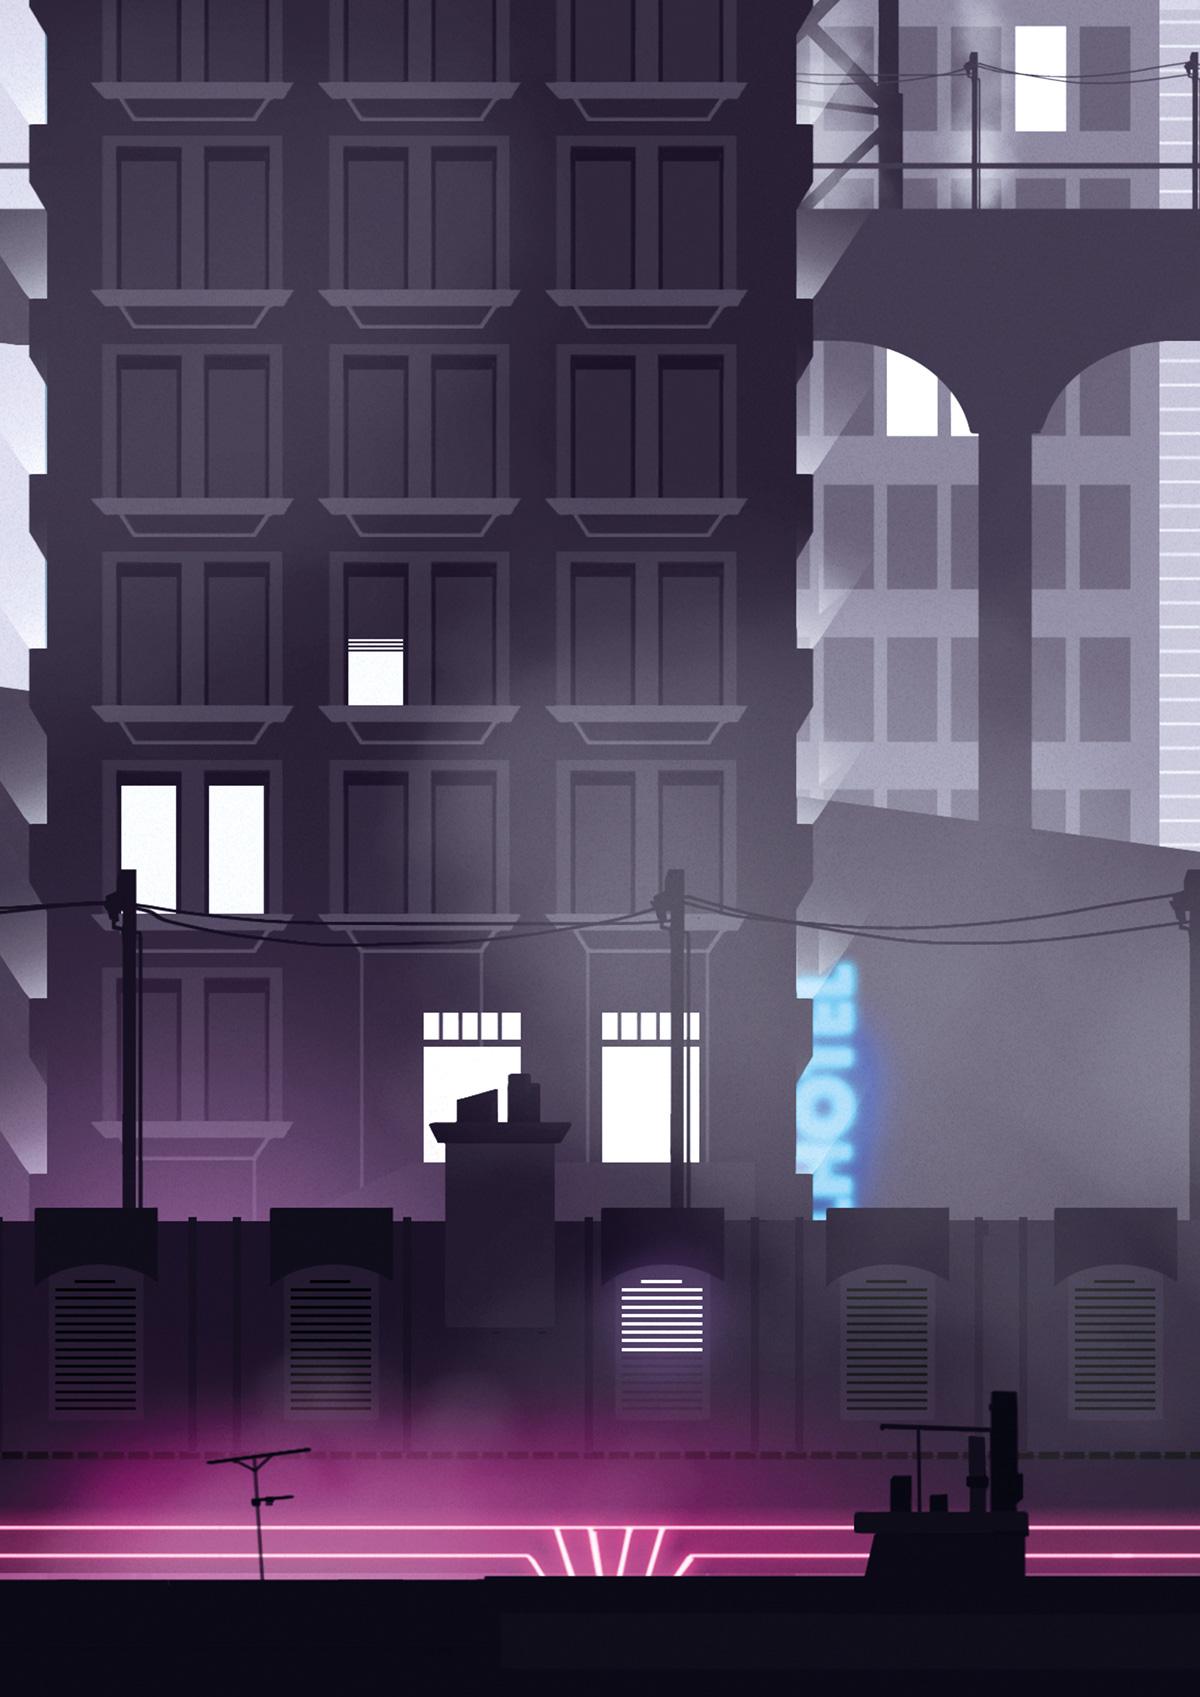 Game Art de Sandrine Pilloud | Colorful Darkness jeu vidéo